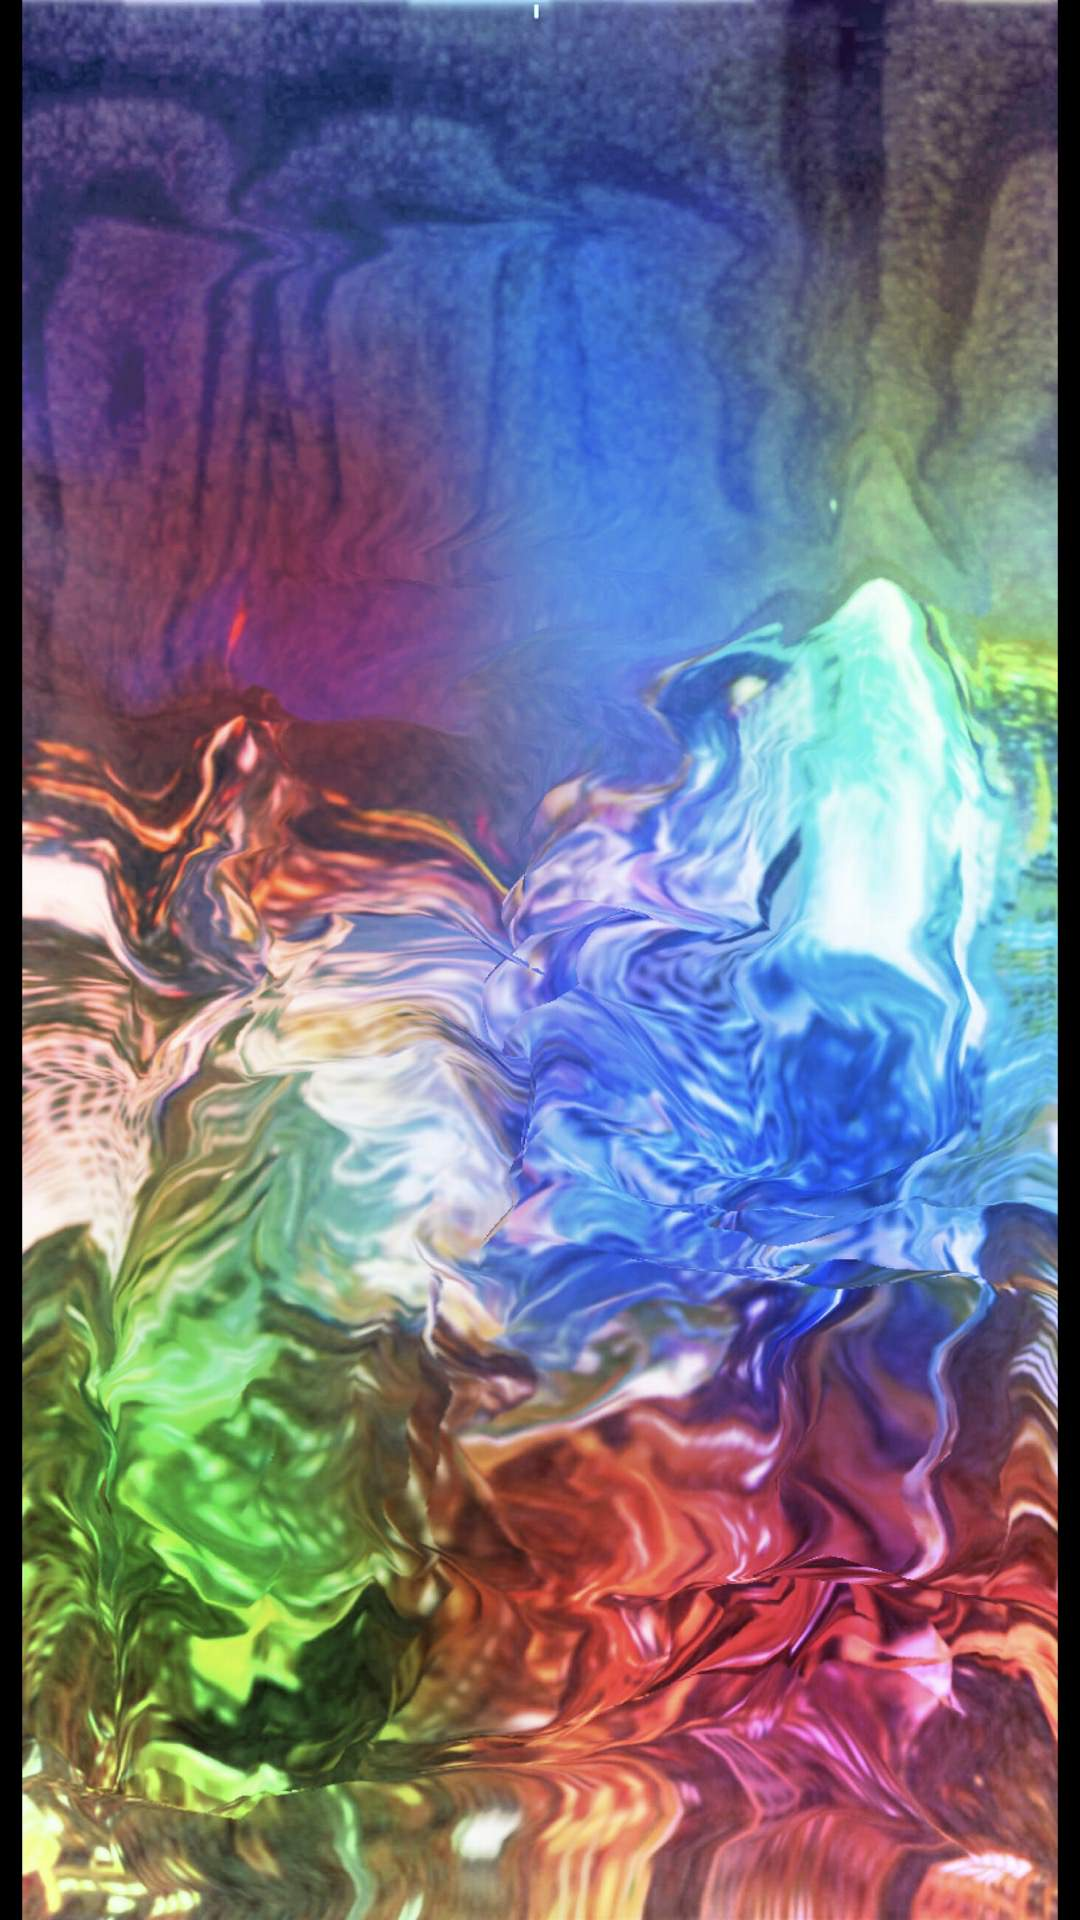 Beautiful Wallpaper Marble Colorful - 1080x1920_170703_1204  Photograph_619864.jpg